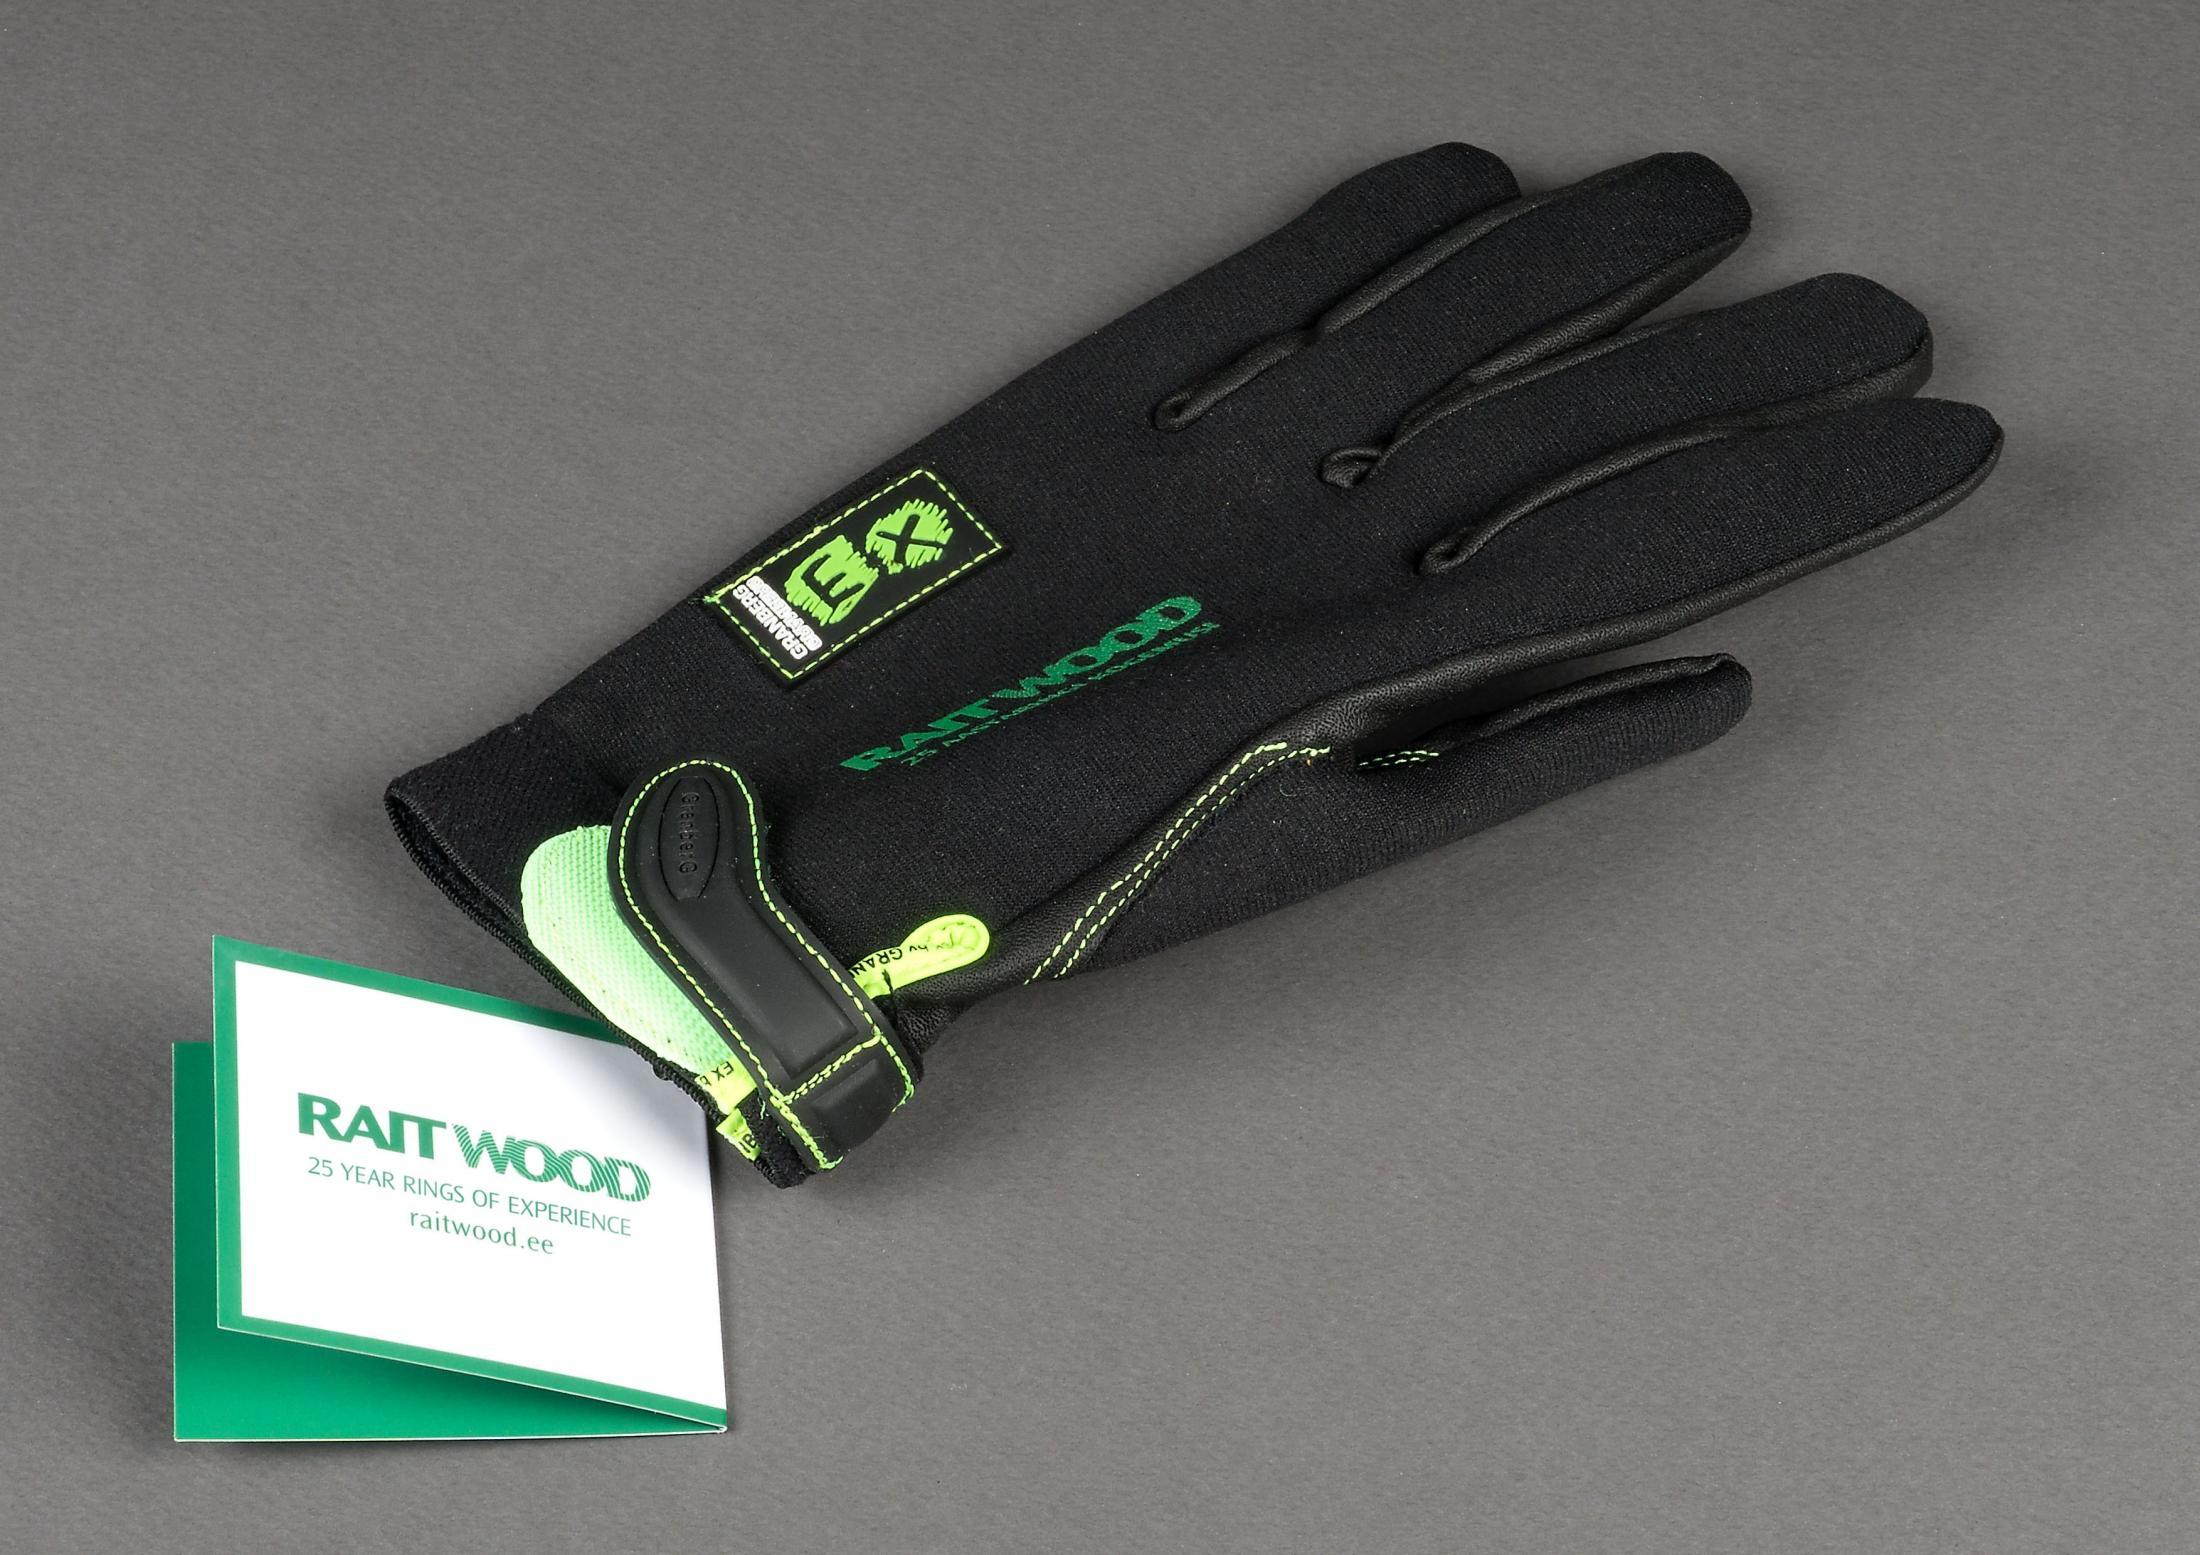 Raitwood Direct Ad - Glove